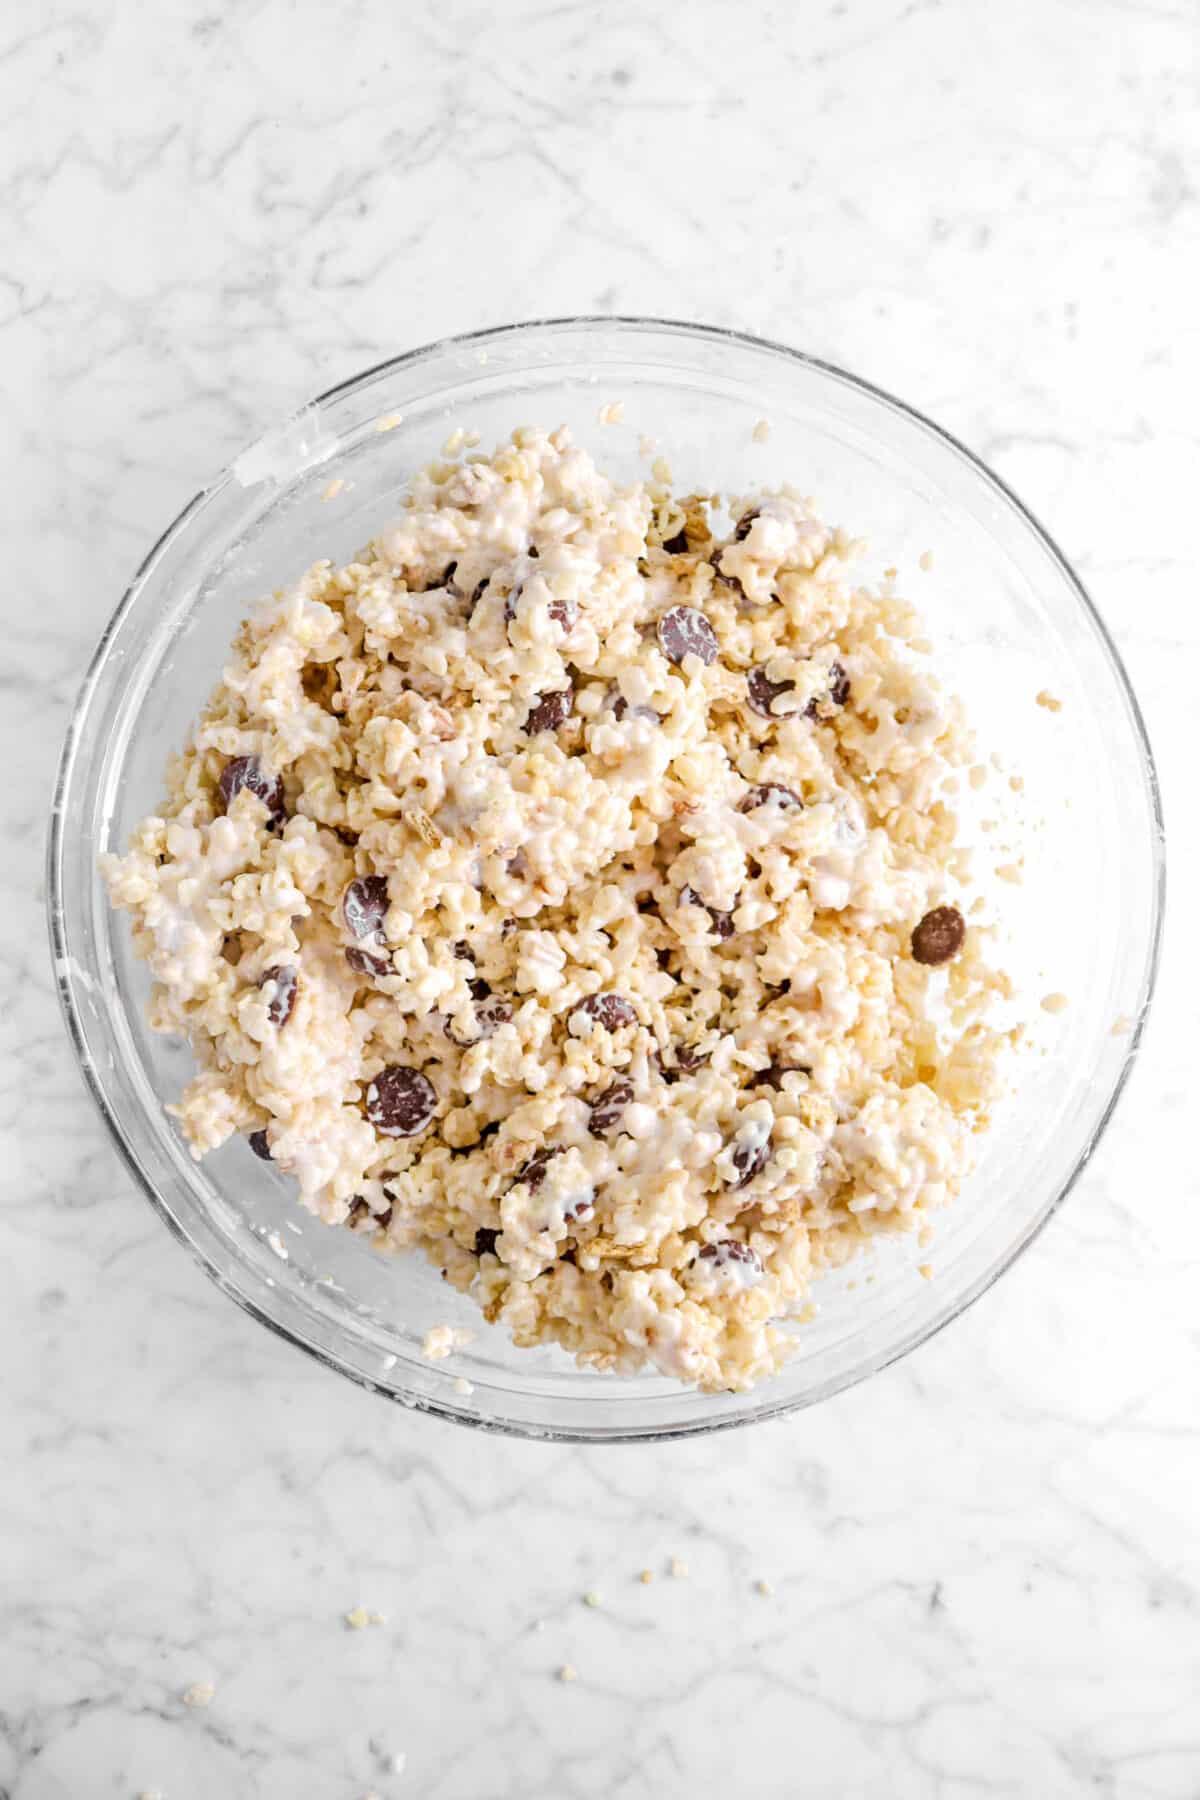 marshmallow stirred into rice krispy mixture